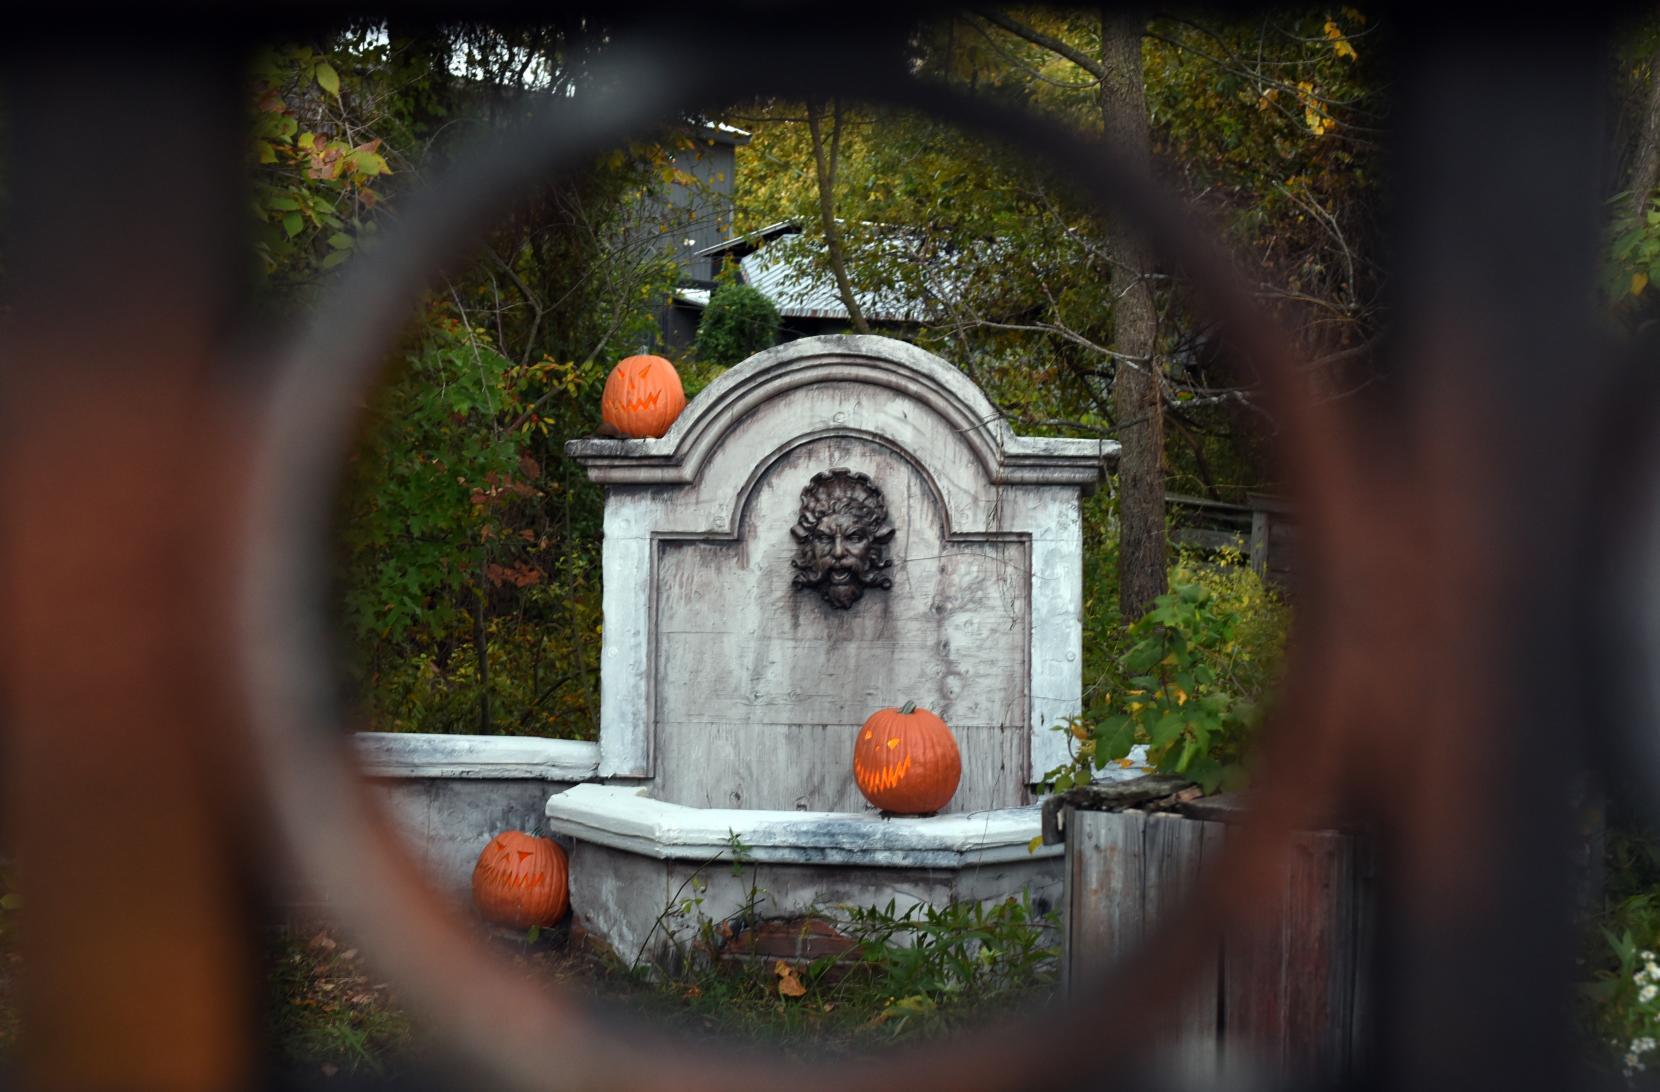 Top Ways to Get Spooked in Bucks County, Pennsylvania